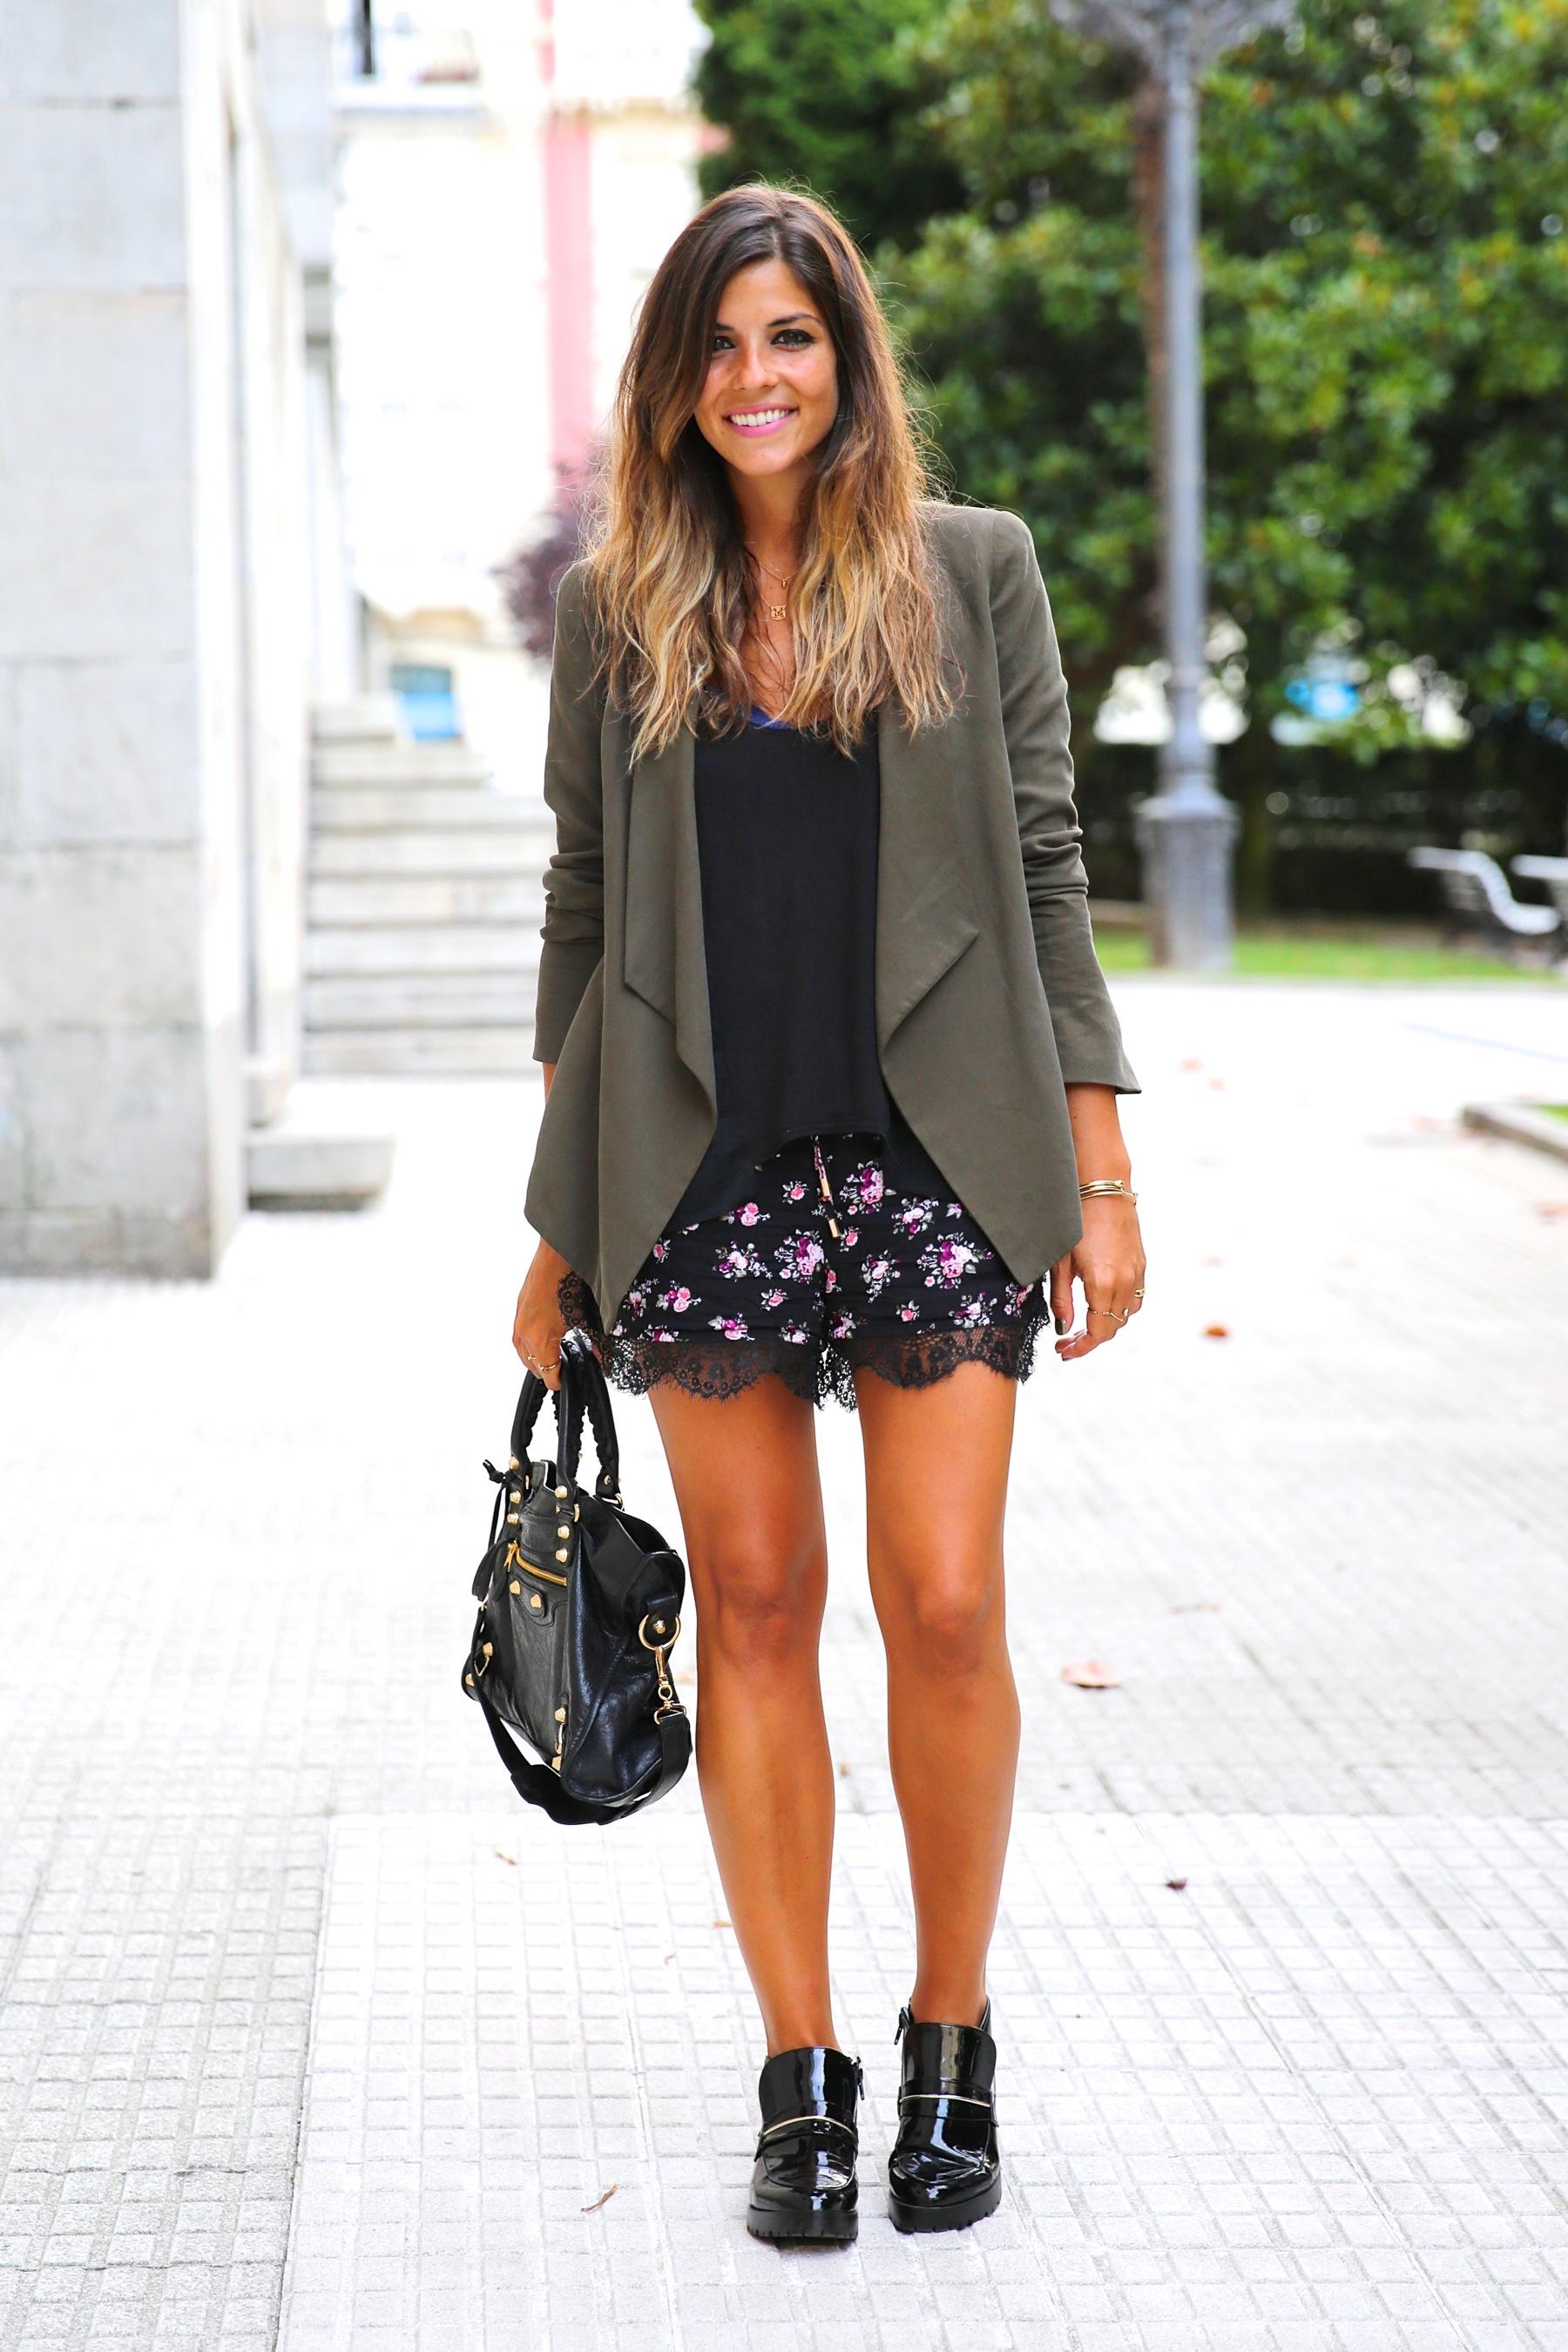 trendy_taste-look-outfit-street_style-ootd-blog-blogger-fashion_spain-moda_españa-khaki_blazer-blazer_caqui-flower_print-estampado_flores-shorts-botines_charol-8